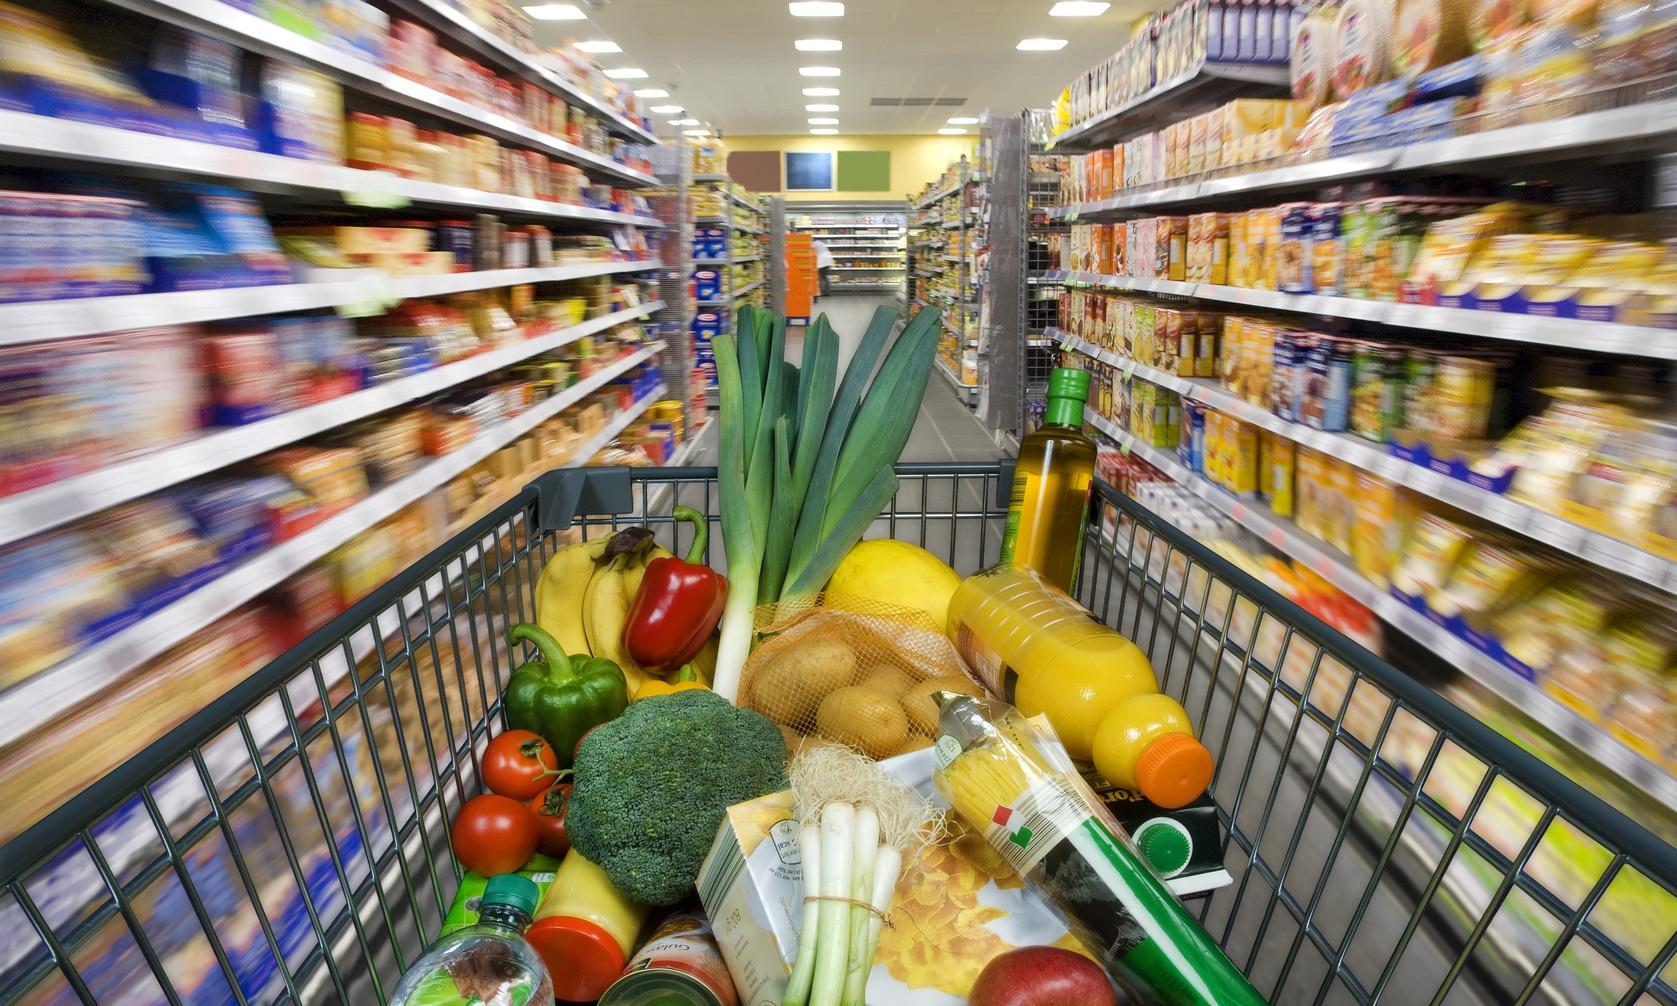 Który sklep najtańszy? Carrefour Fotolia 53864802 Subscription Monthly M crop